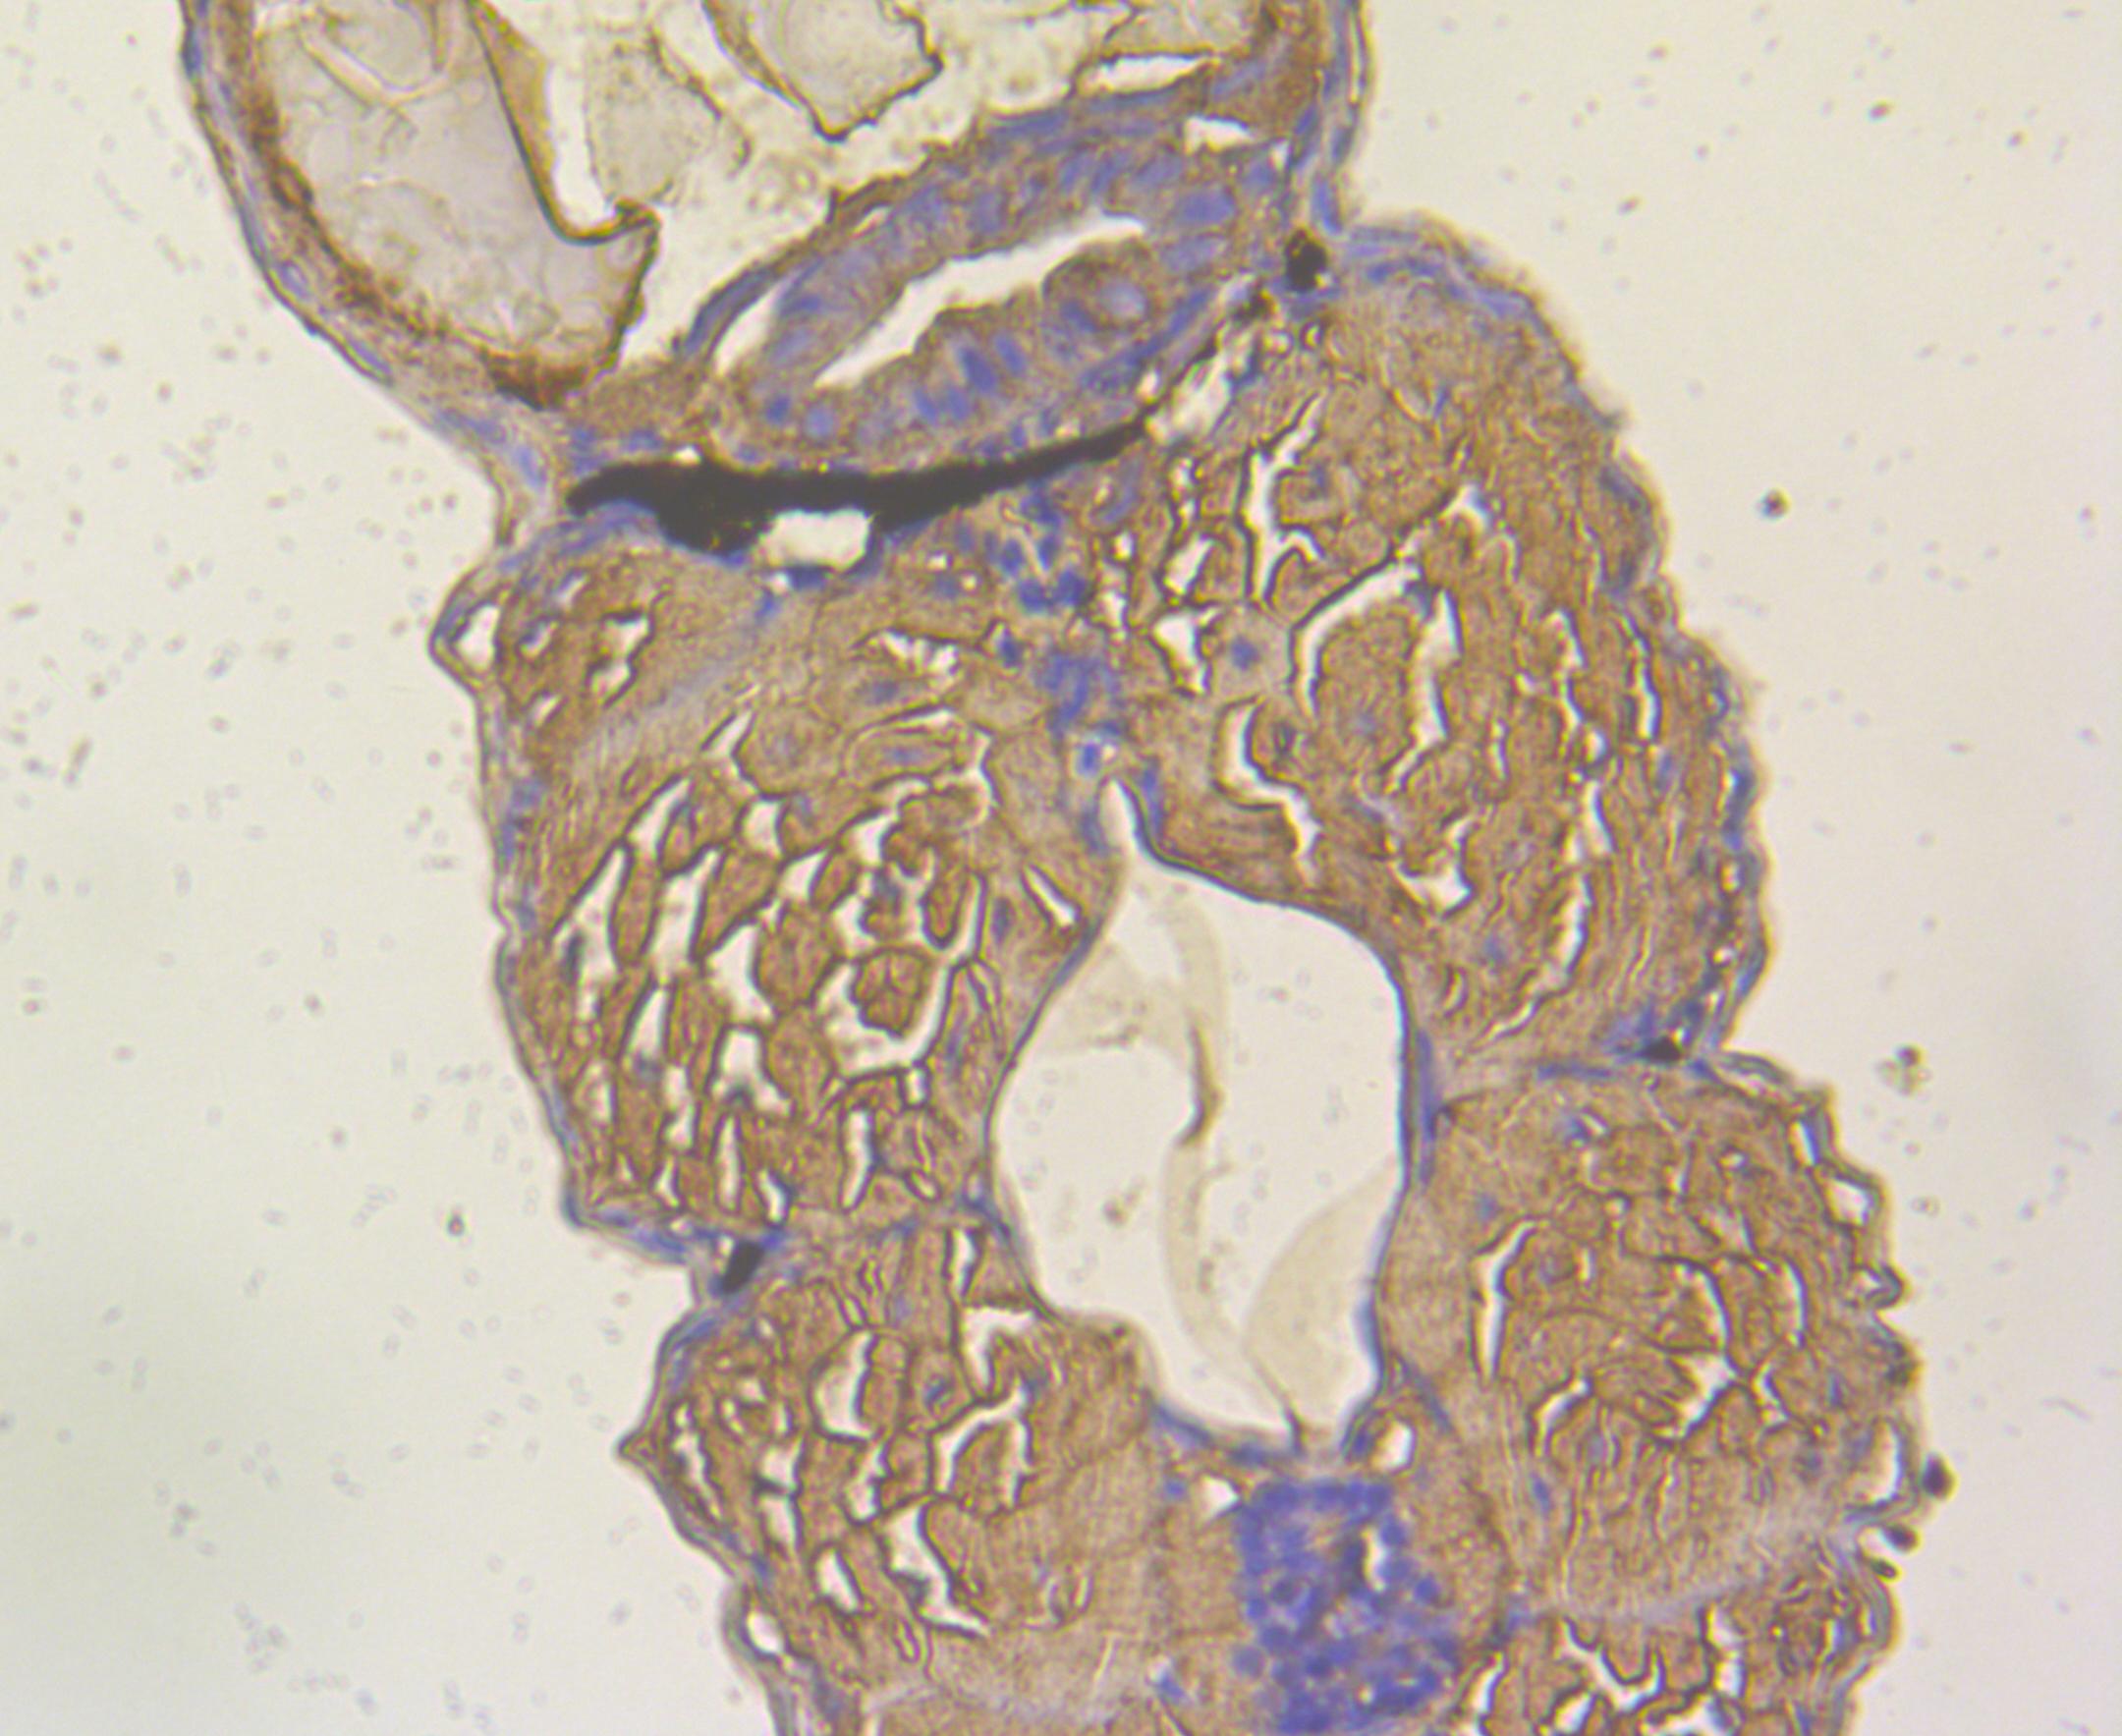 Immunohistochemical analysis of paraffin-embedded Zebrafish embryos tissue section using anti-YARS2 antibody. Counter stained with hematoxylin.